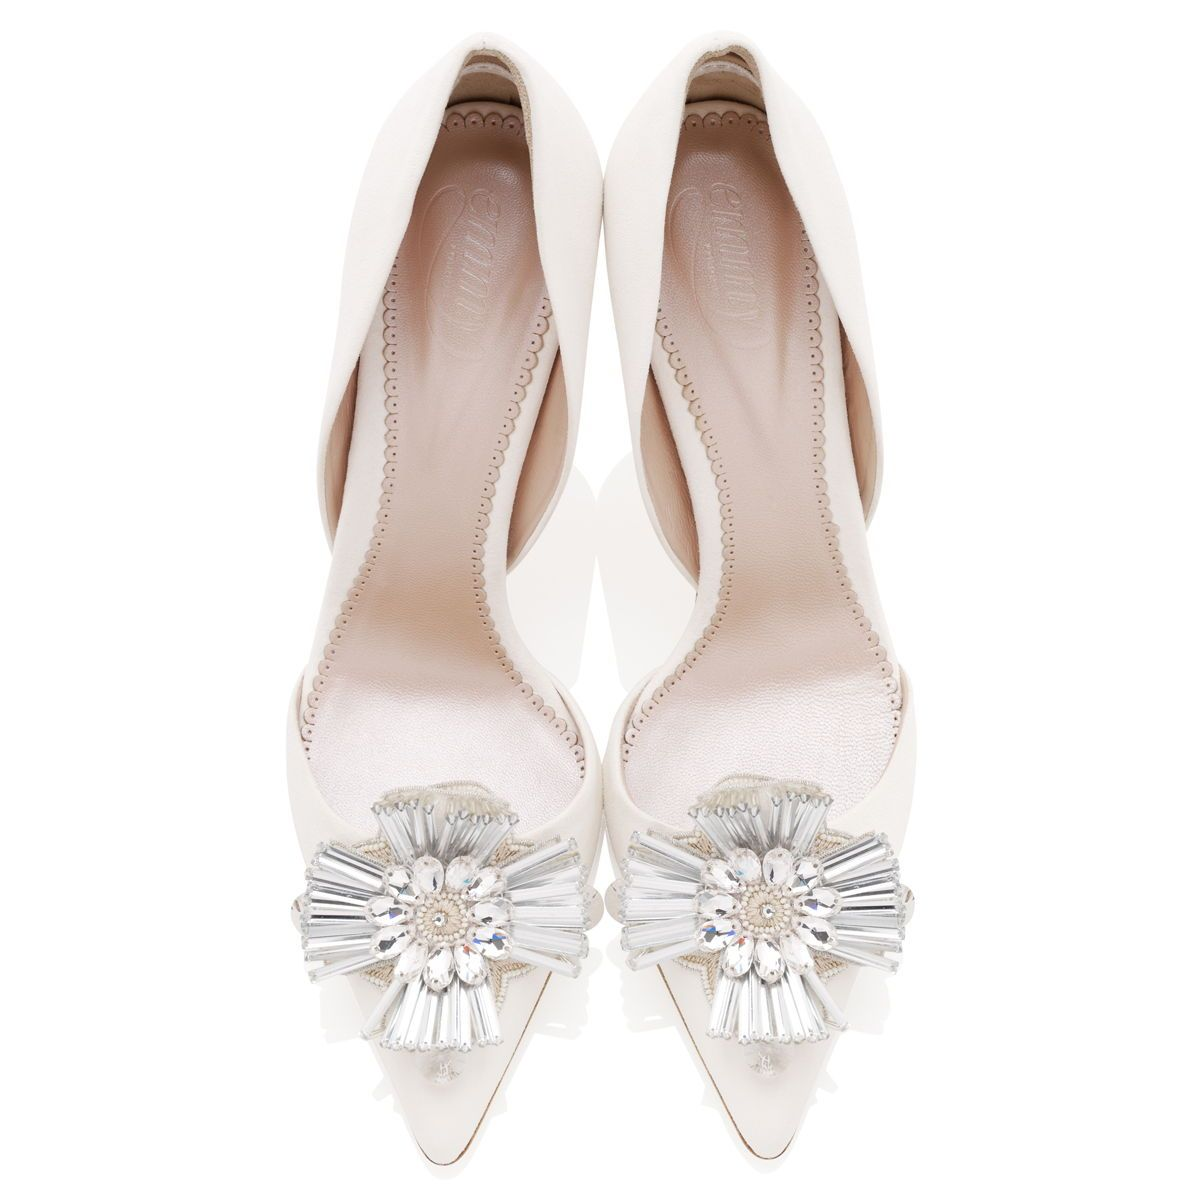 Rhinestone Wedding Bridal Bridesmaid Shoes Heels Clips Accessories Dance Party